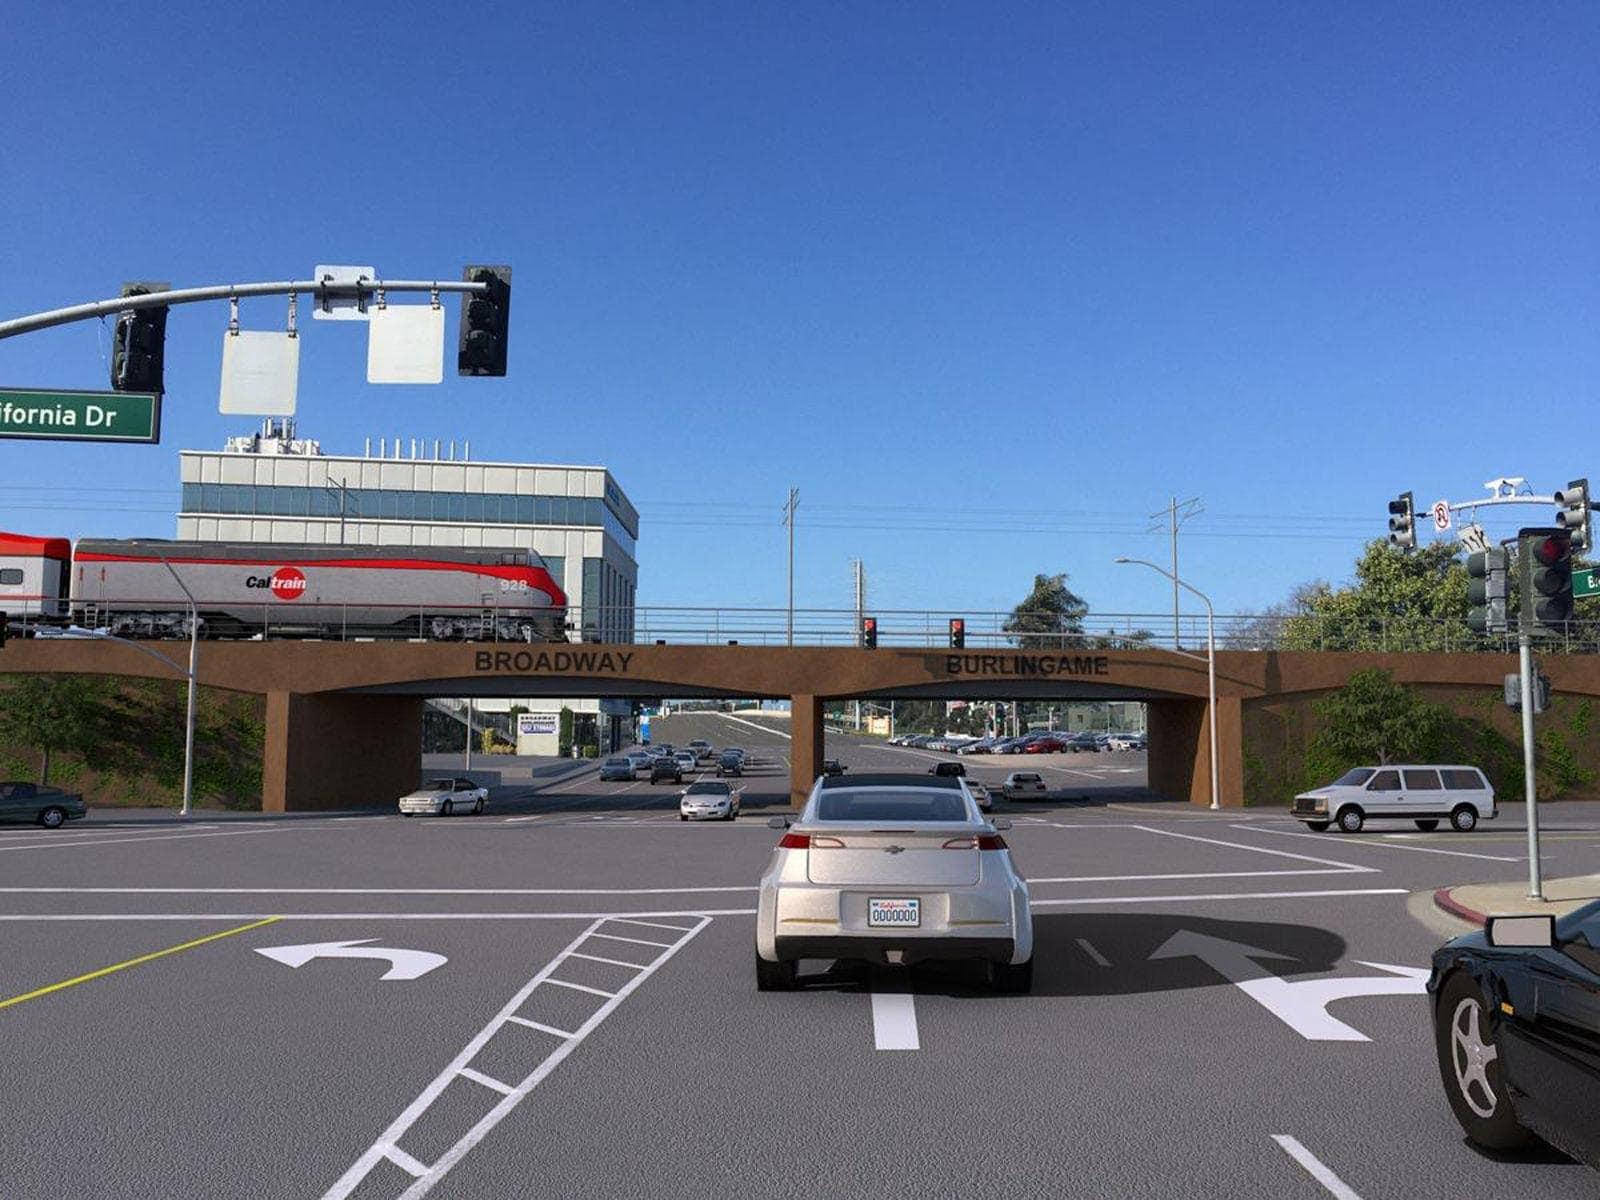 Caltrain Burlingame grade separation mockup